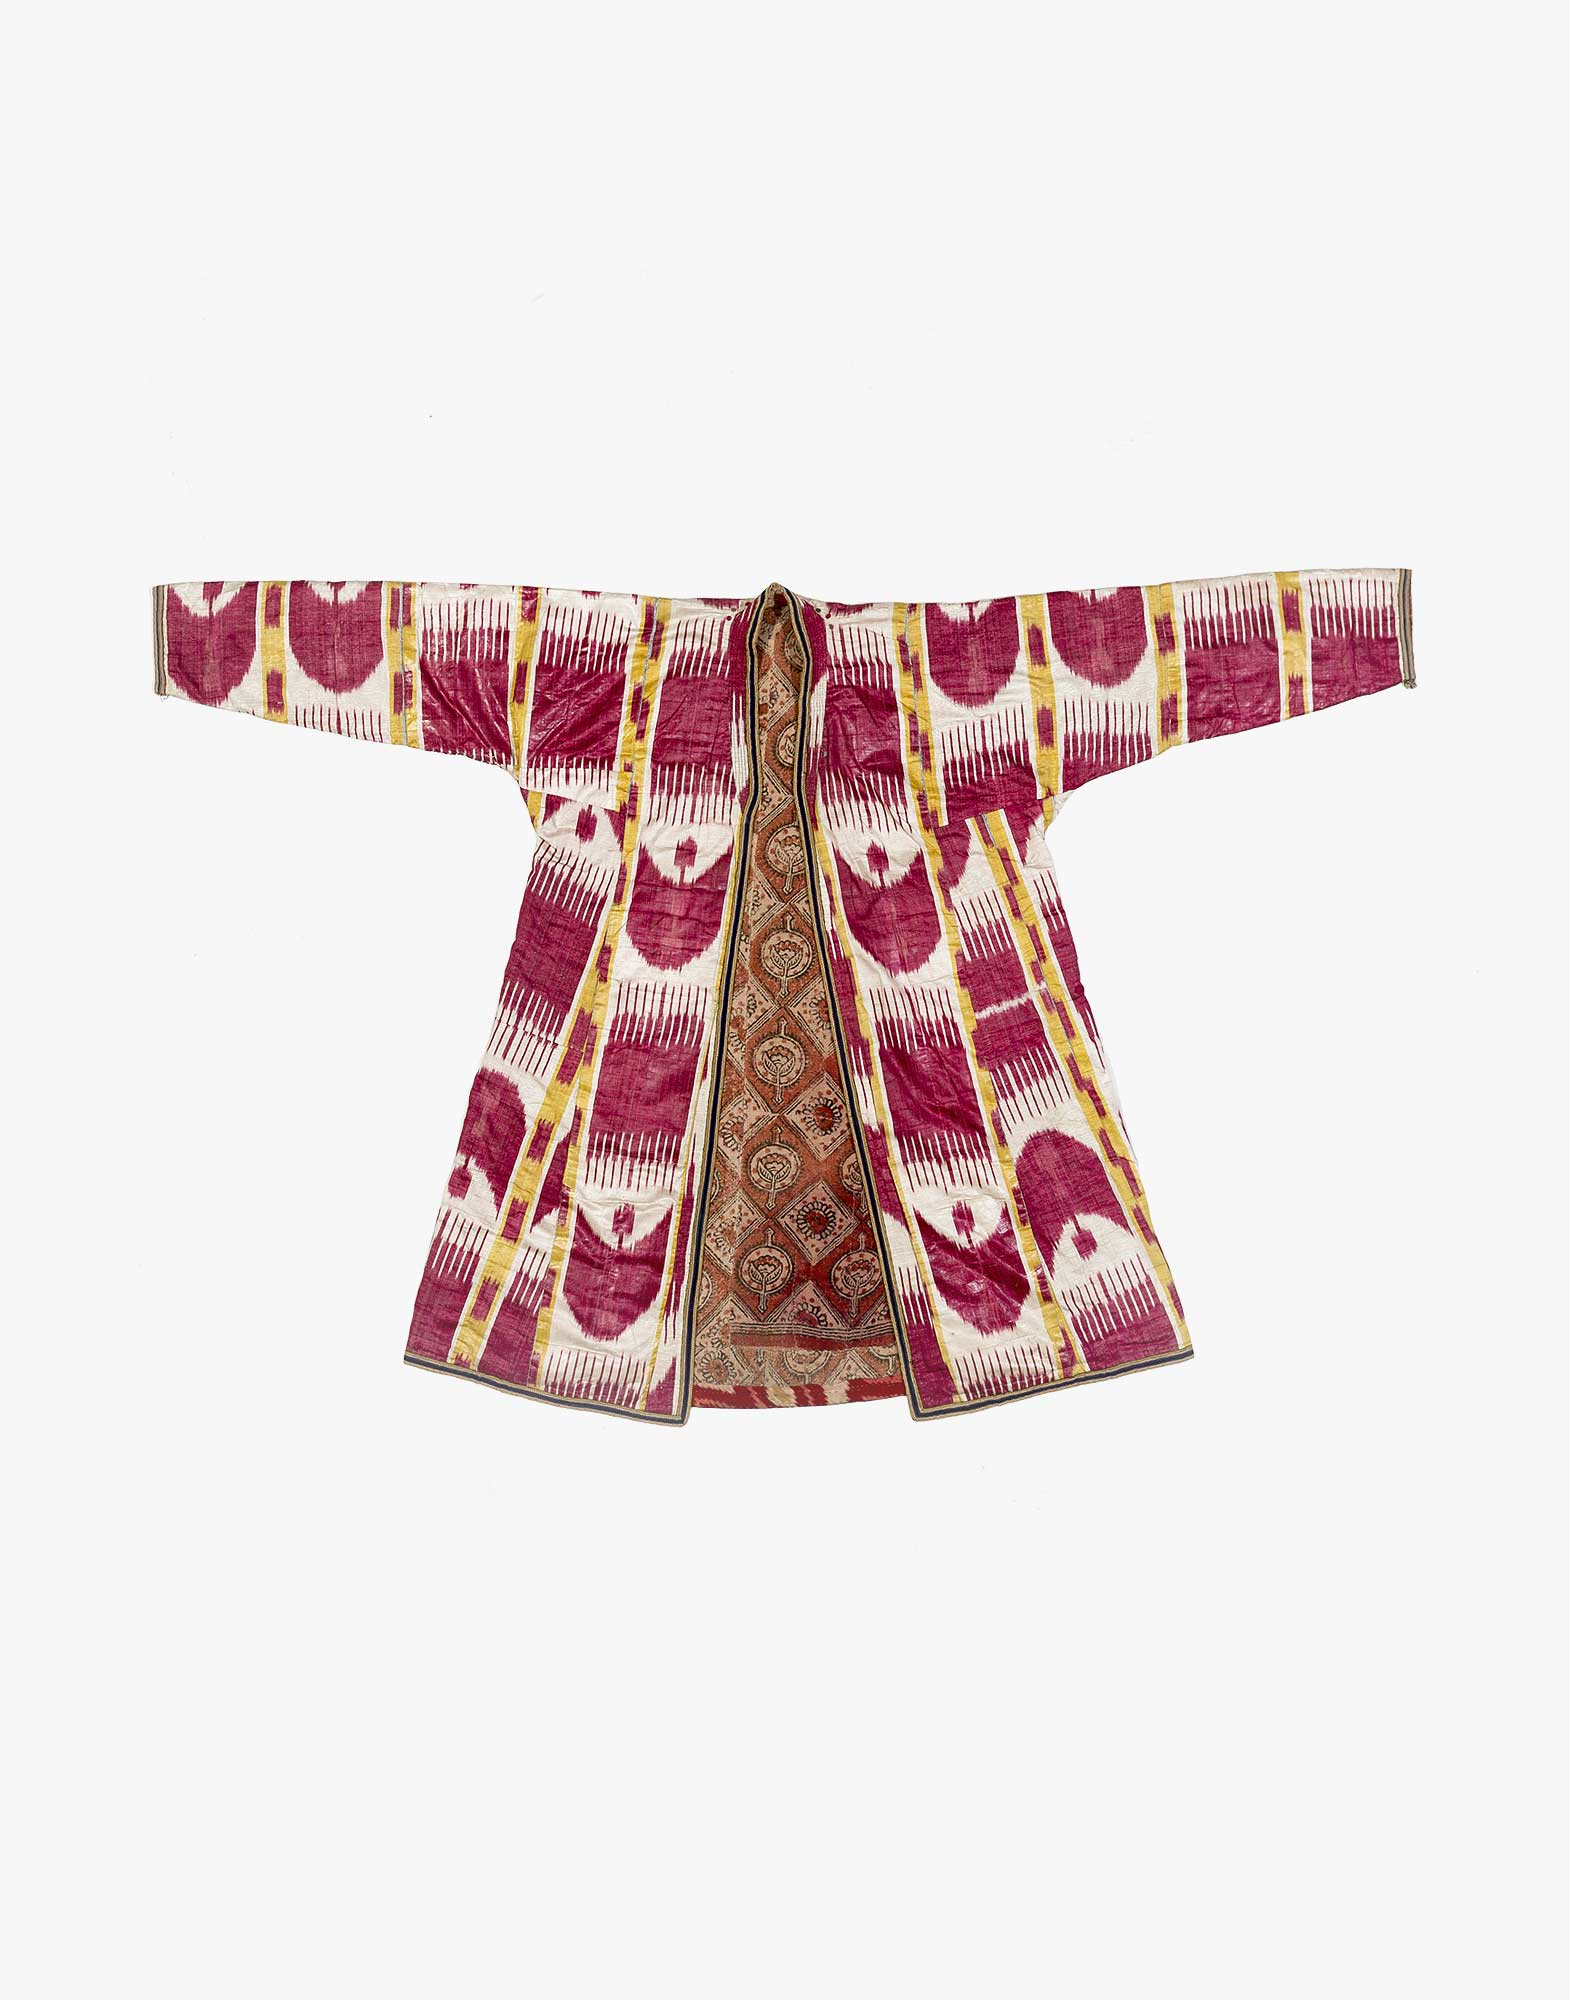 Central Asian Uzbek Ikat Chapan Robe